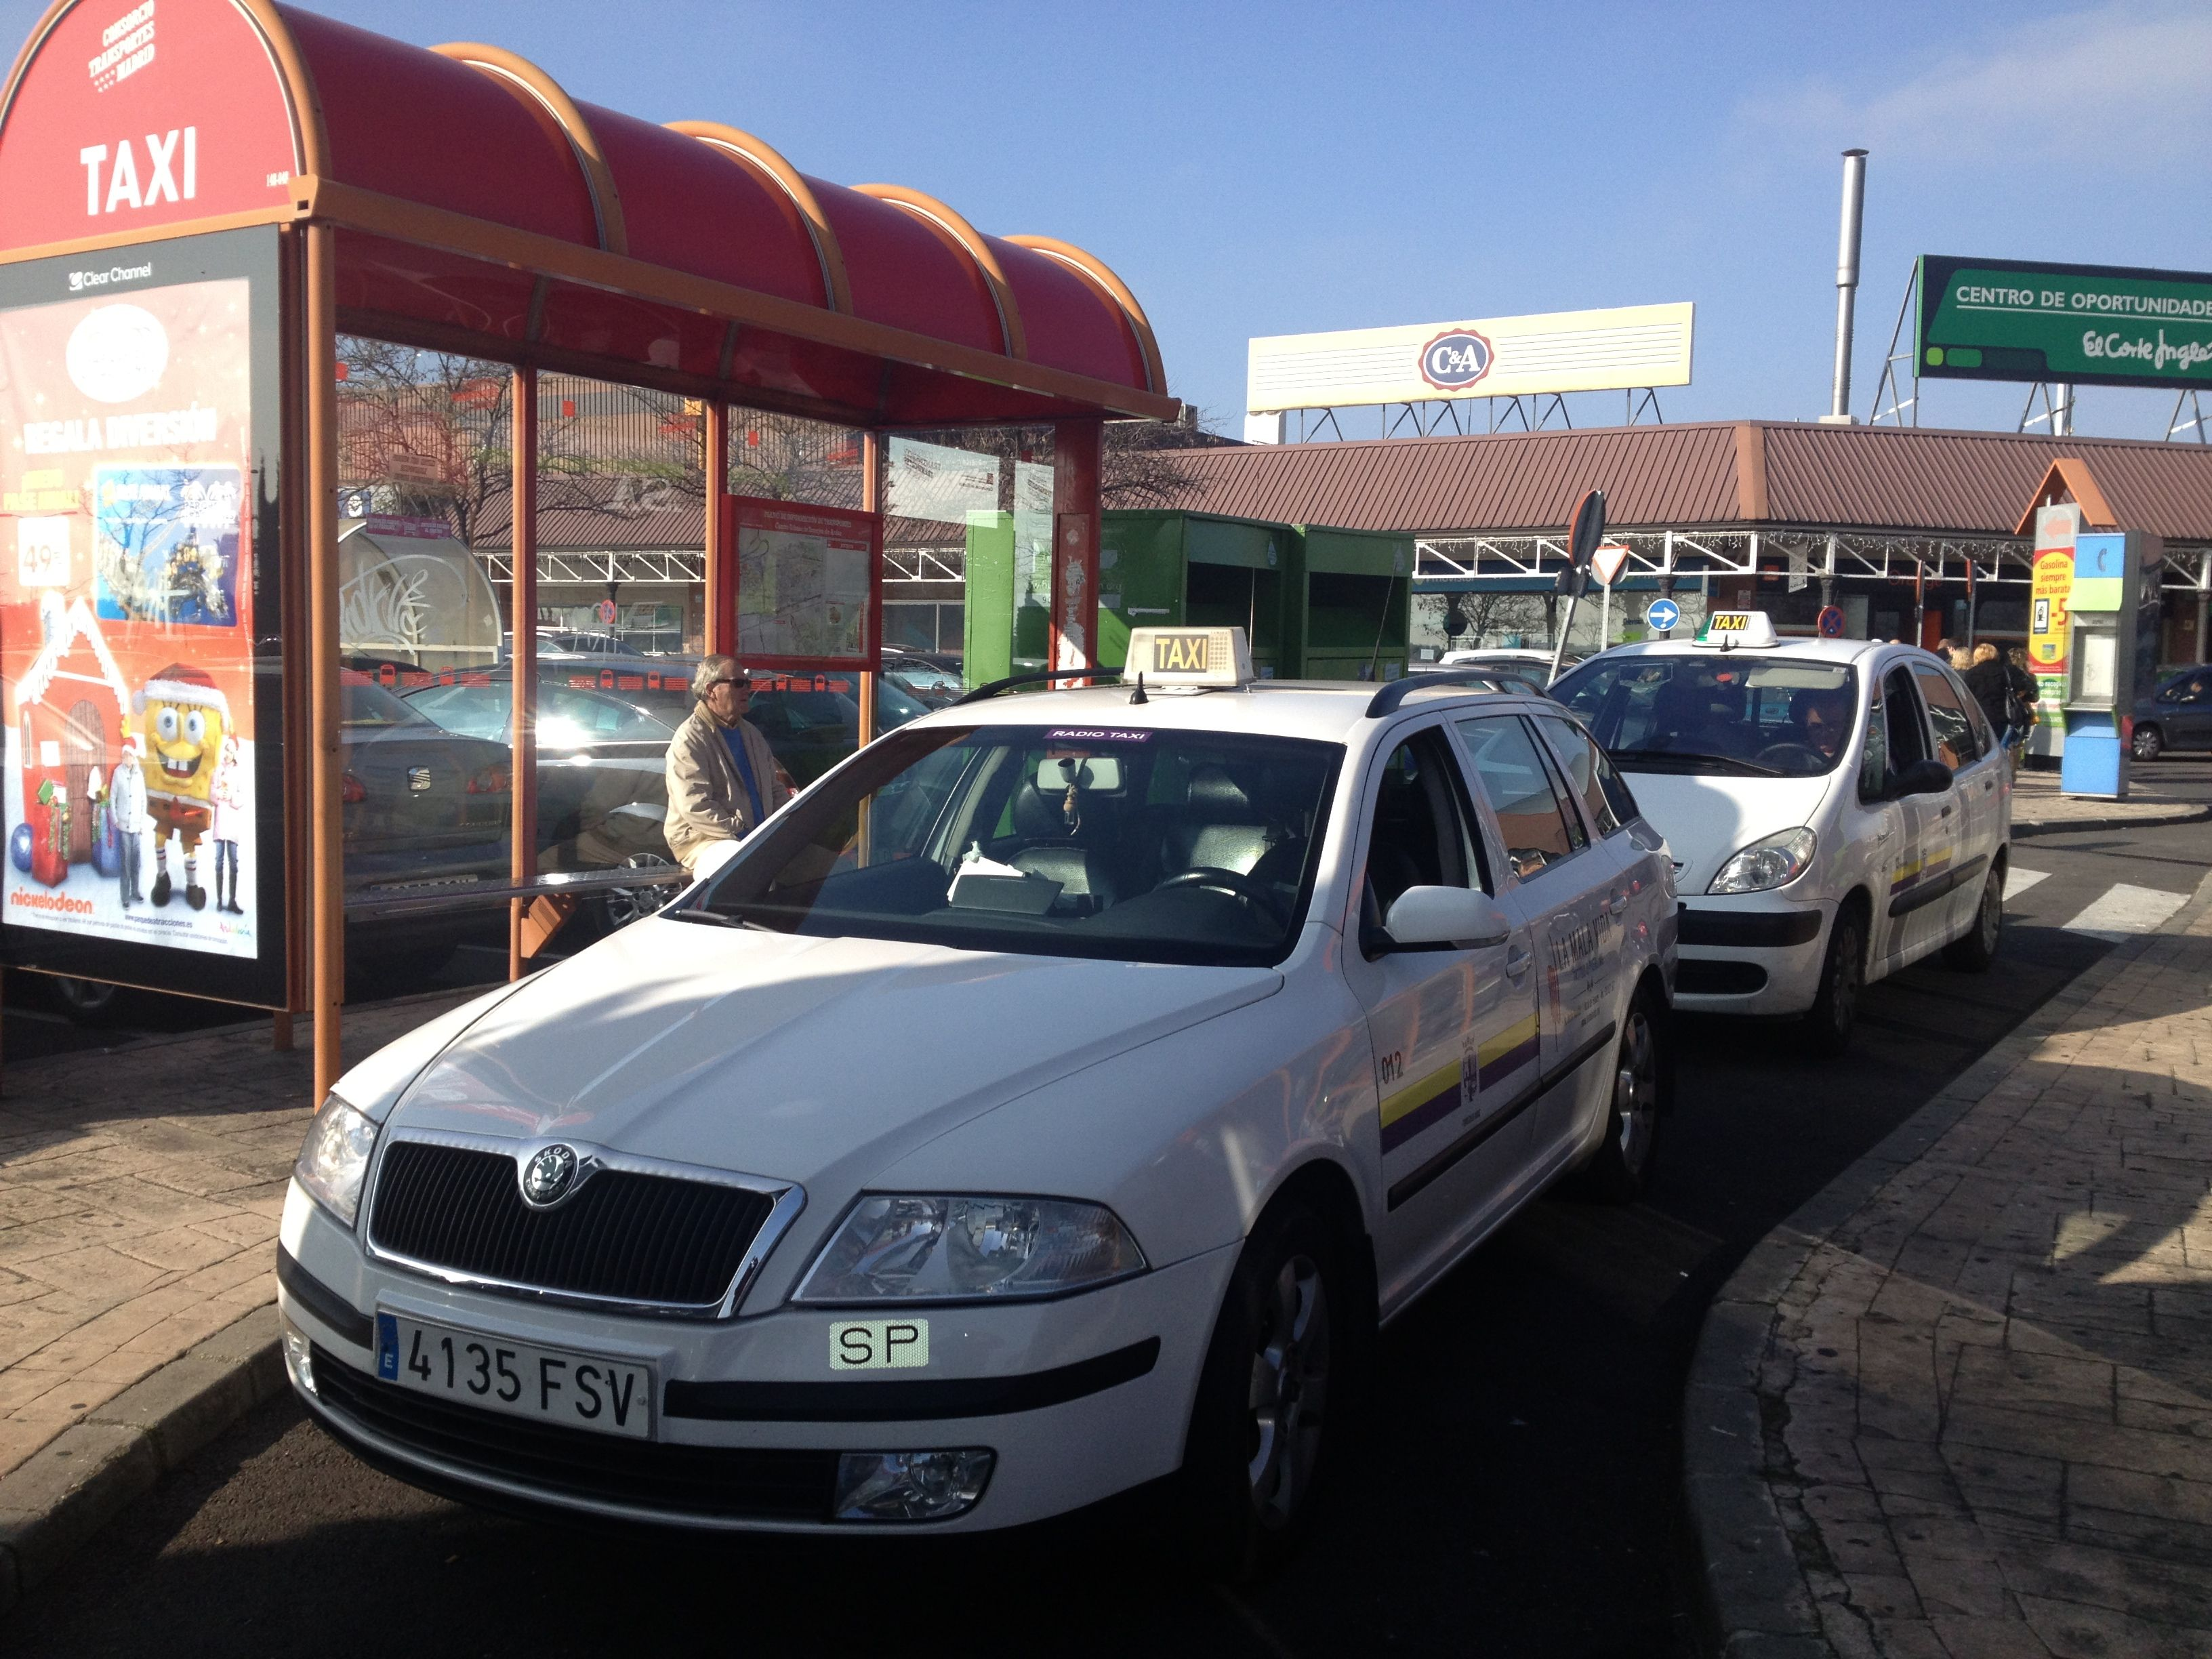 Foto 3 de Taxis en Torrejón de Ardoz | Radio Taxi Torrejón